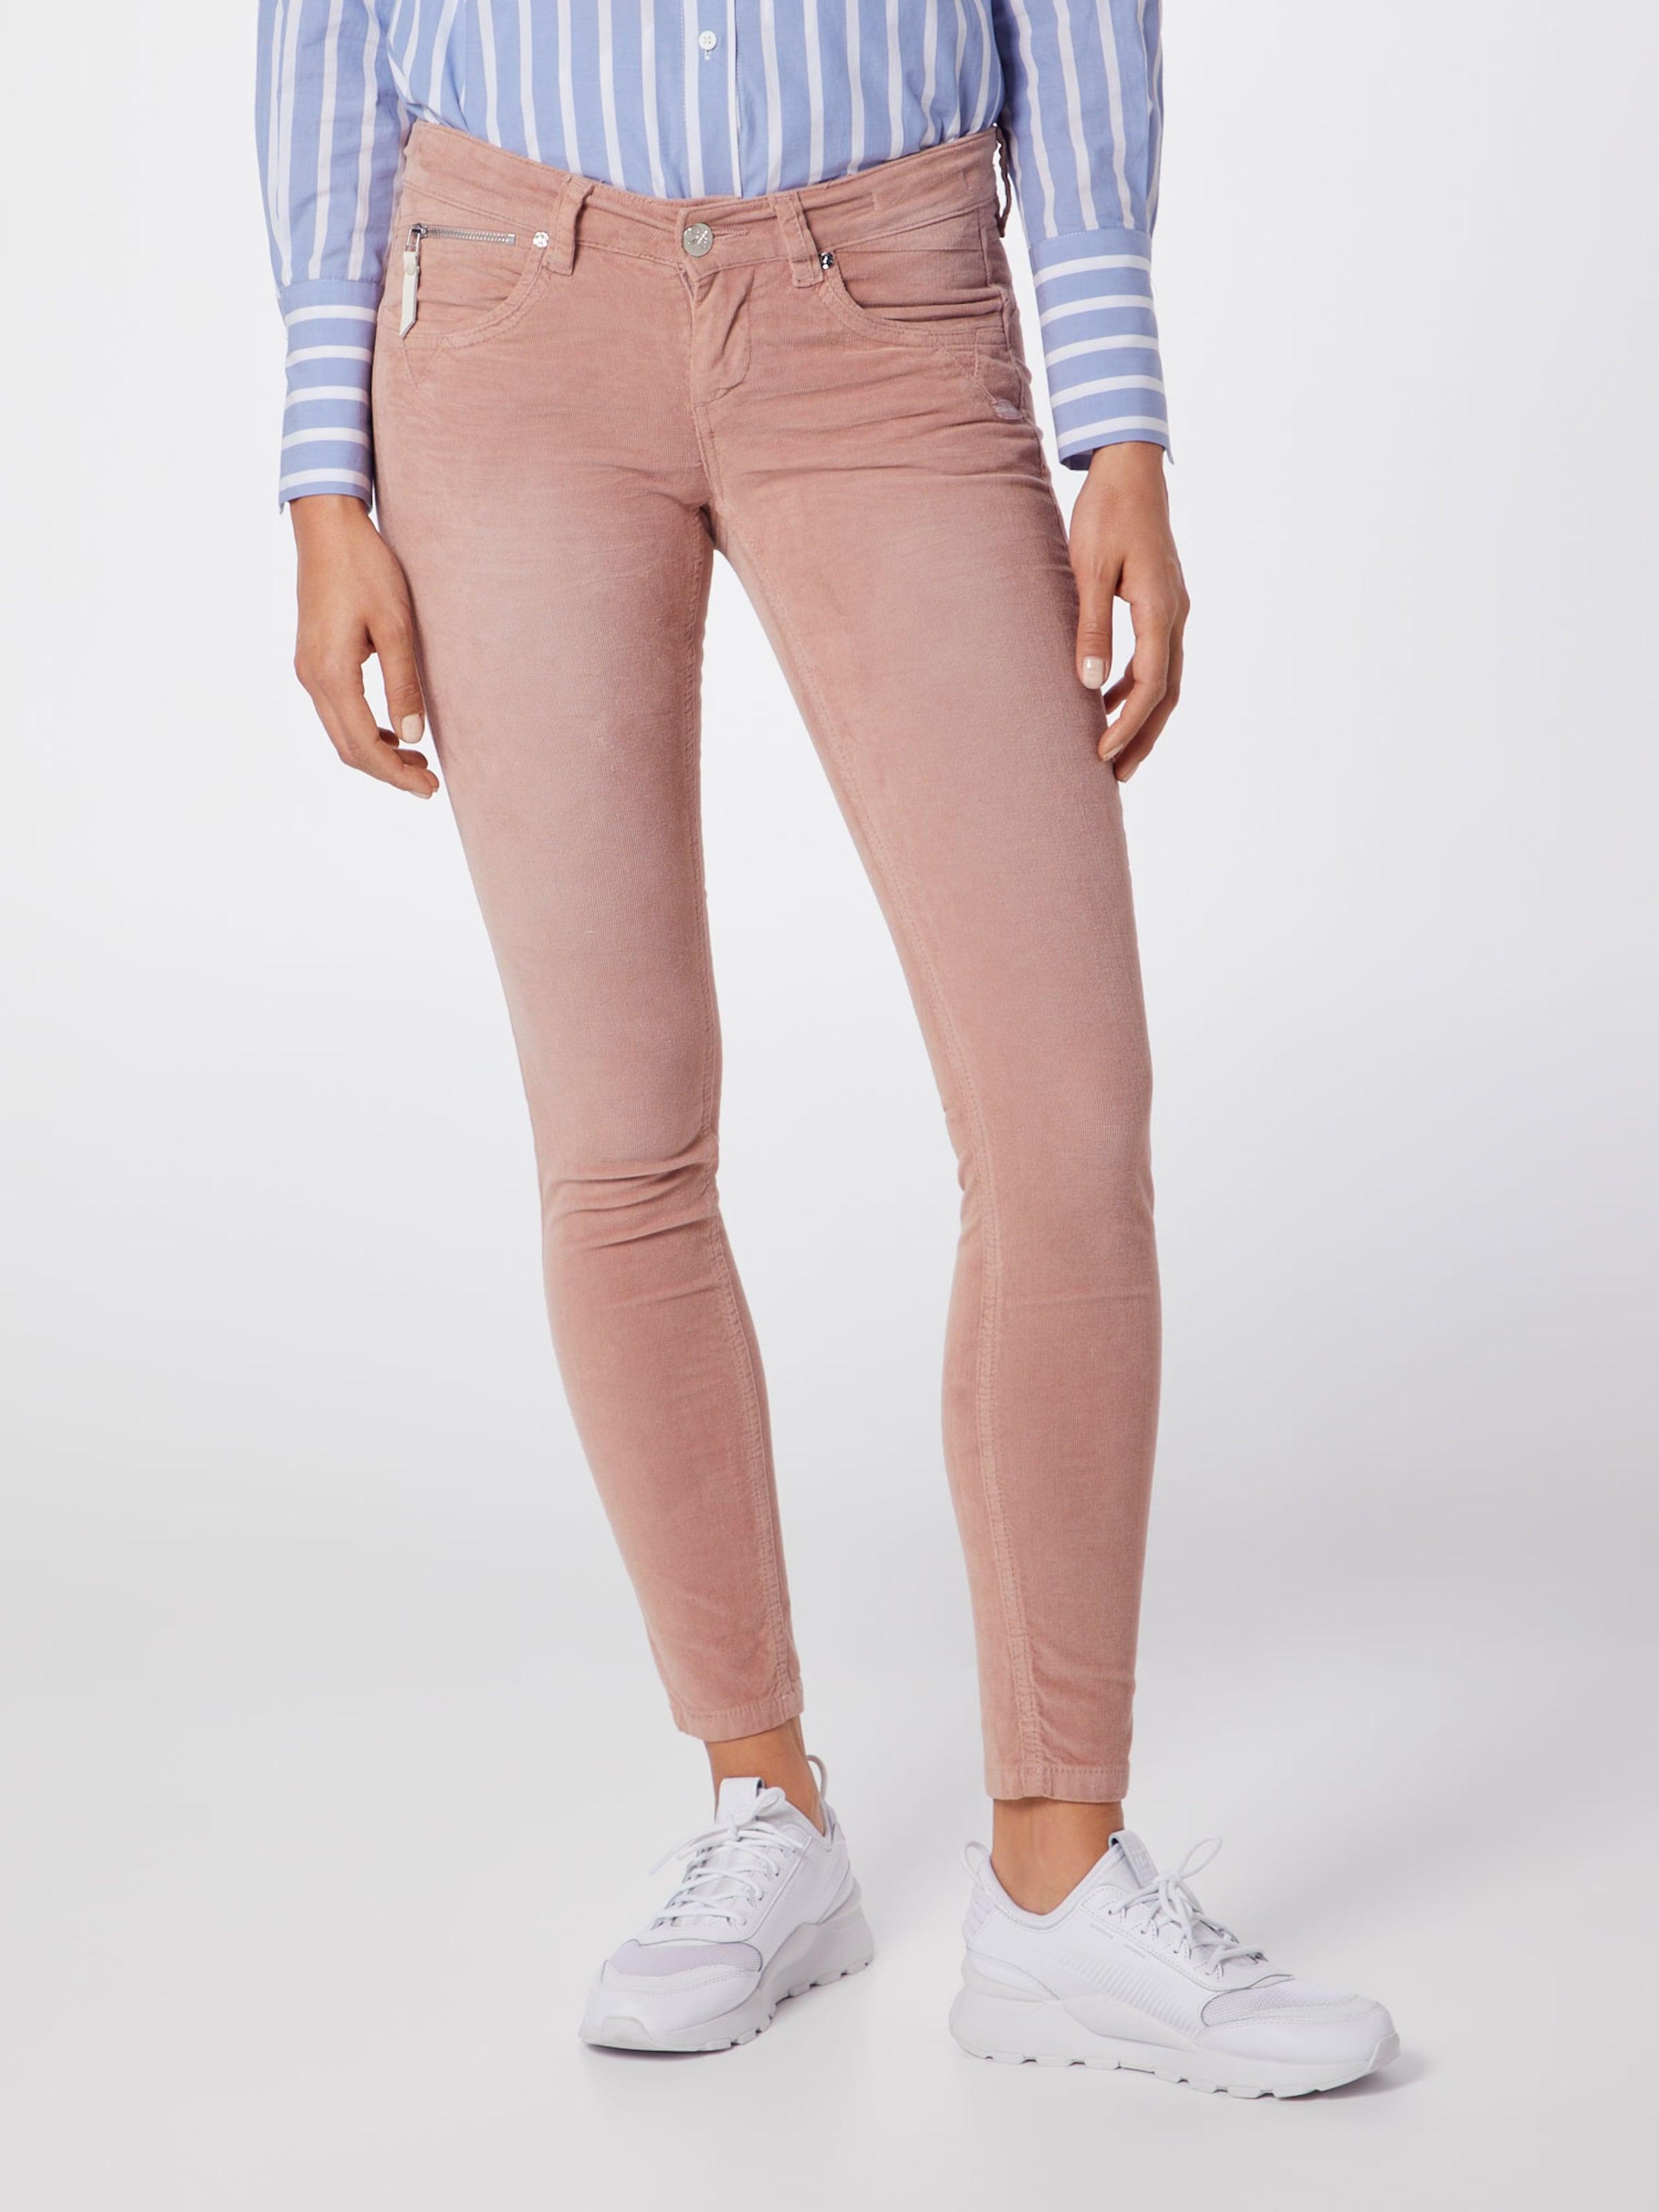 Coduroy Skinny' 'nikitaVintage Gang Jeans In Pink PnkO80ZNXw